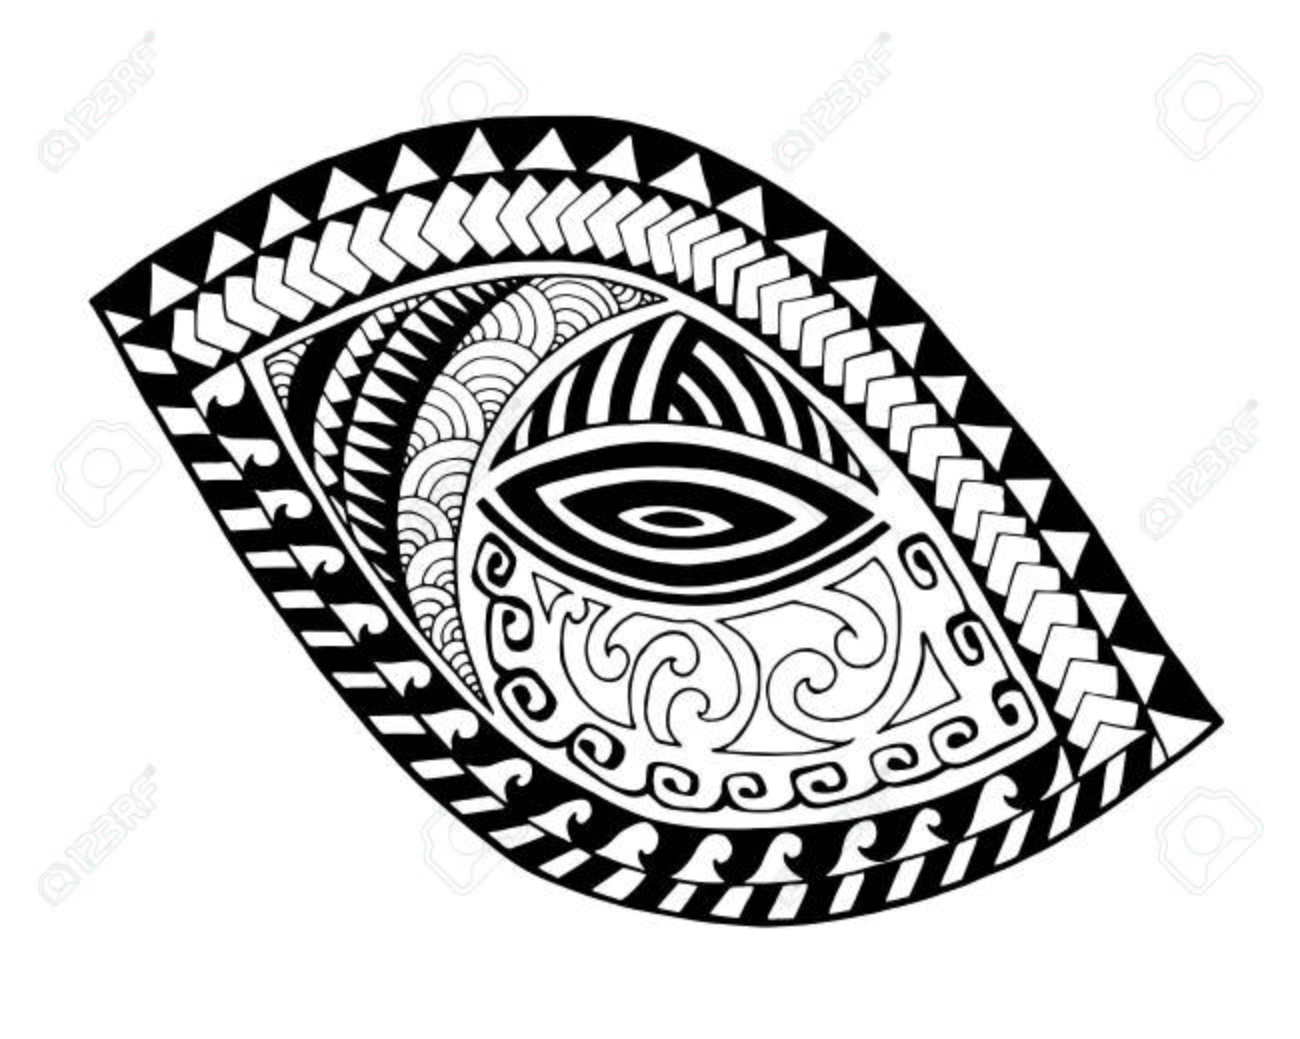 Tatuajes Maories Diseos Galerie Tatouage